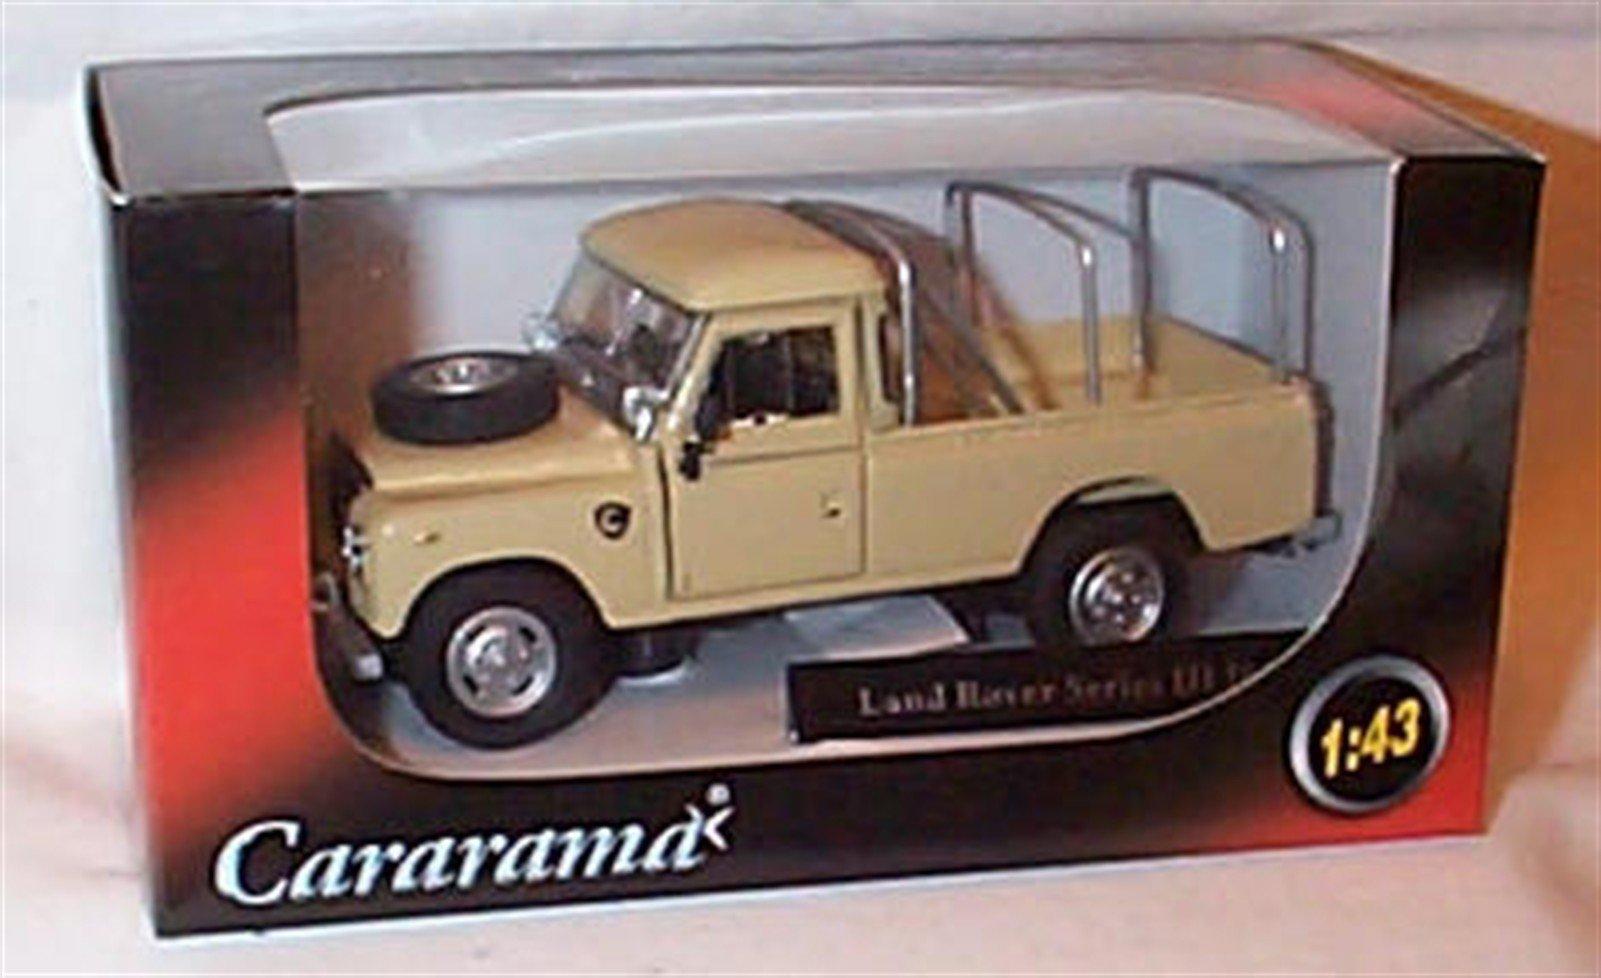 Cararama LAND R0VER series III 109 sand car 1.43 scale diecast model